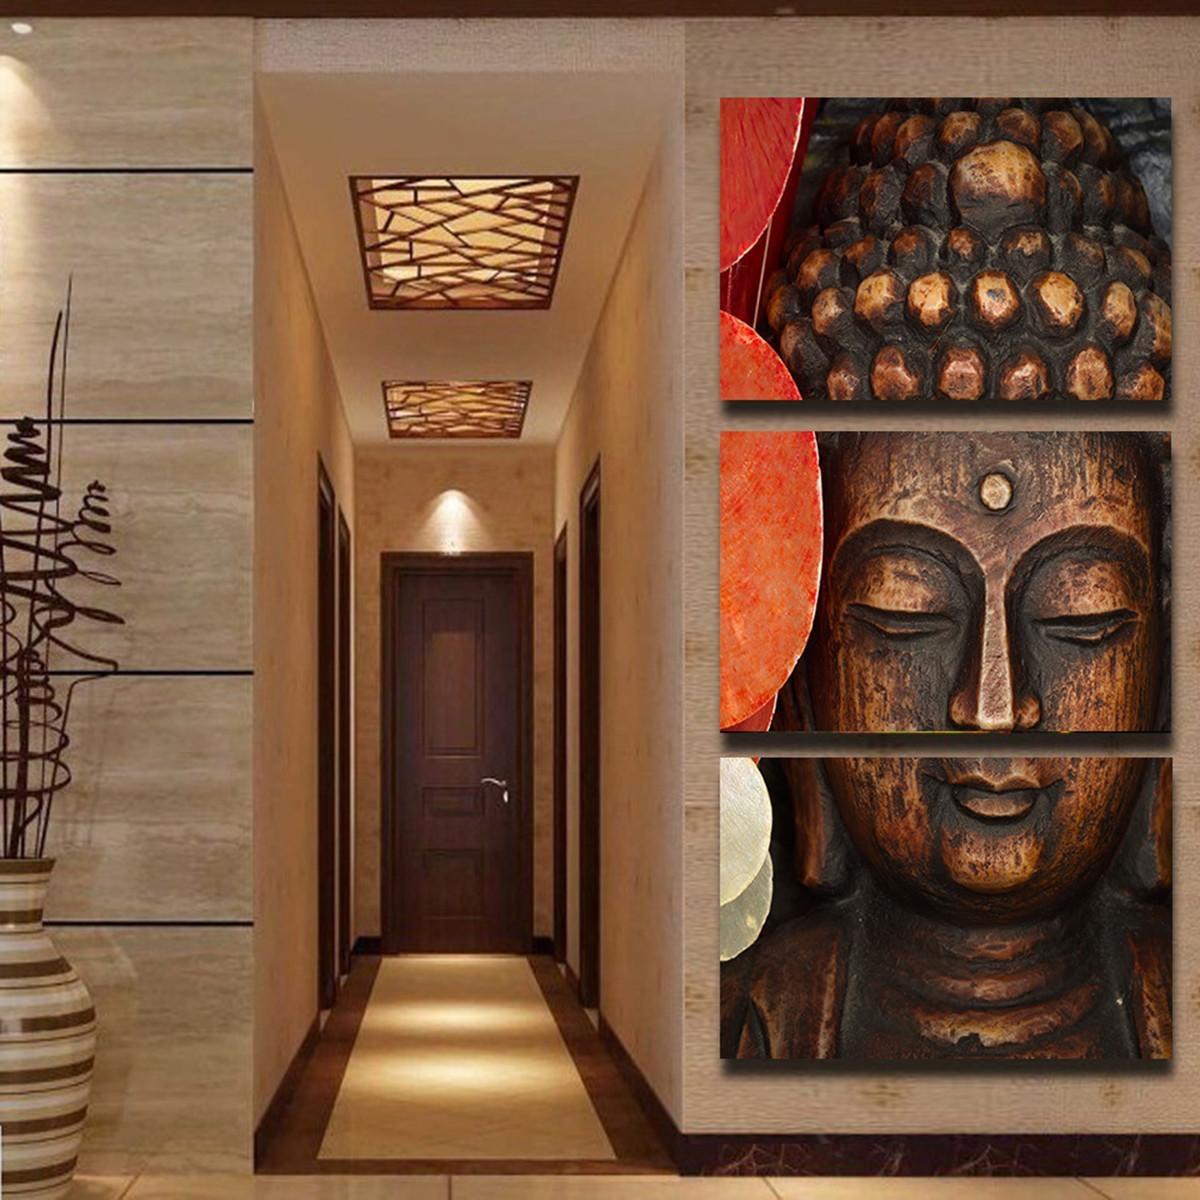 Aliexpress : Buy Jermyn 3 Piece Wall Art Diy 3D Buddha Oil Pertaining To 3D Buddha Wall Art (View 6 of 20)